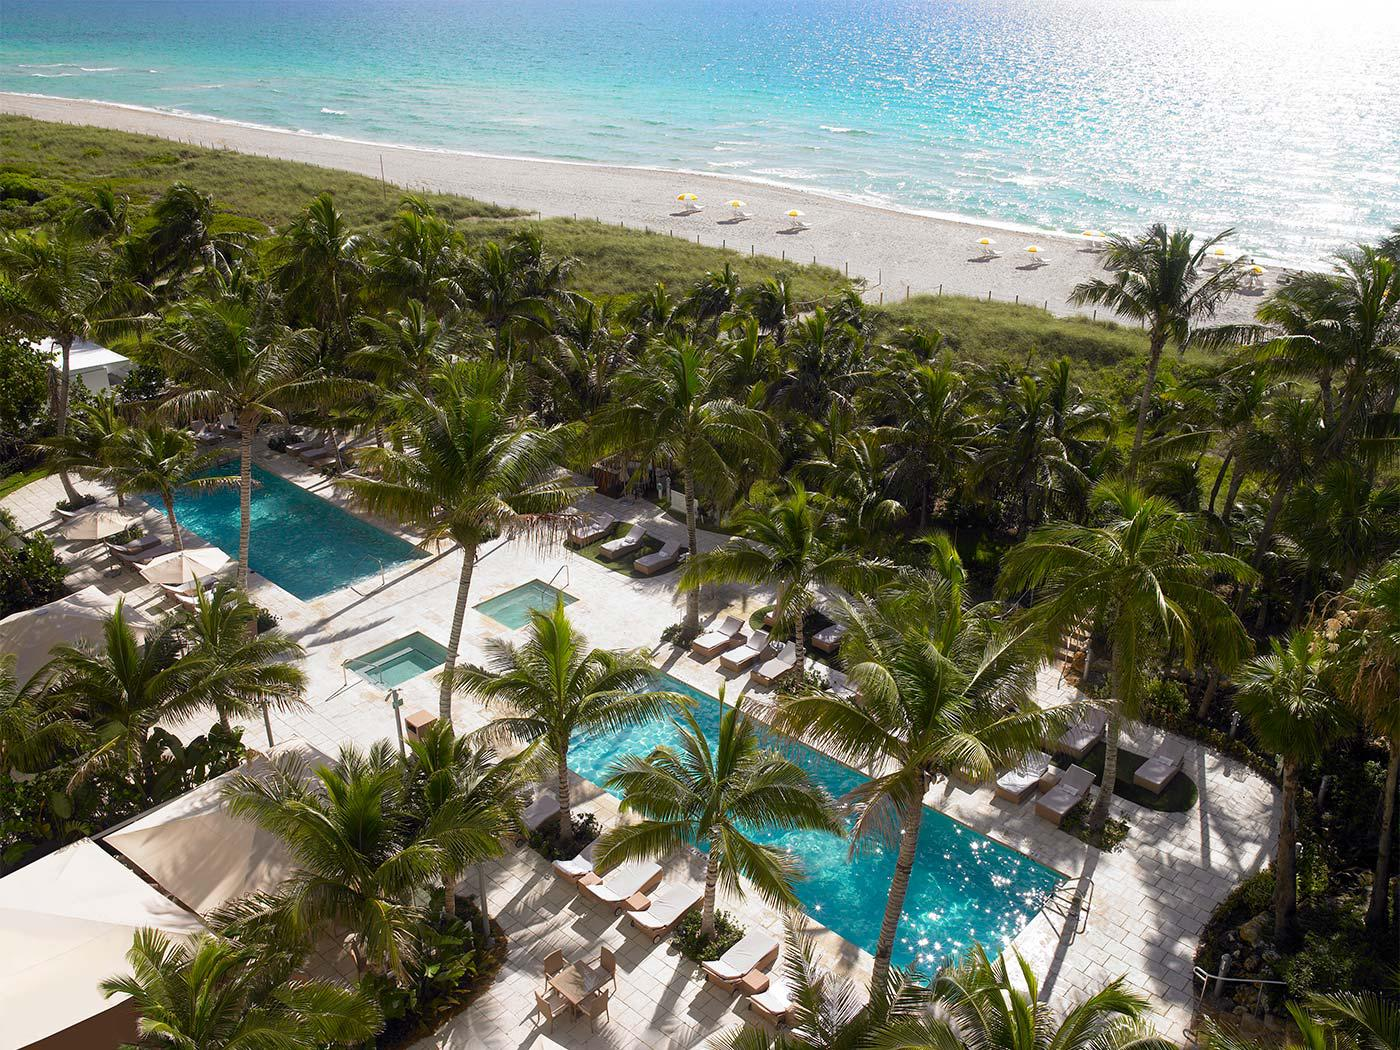 Grand Beach Hotel Miami Beach image 3